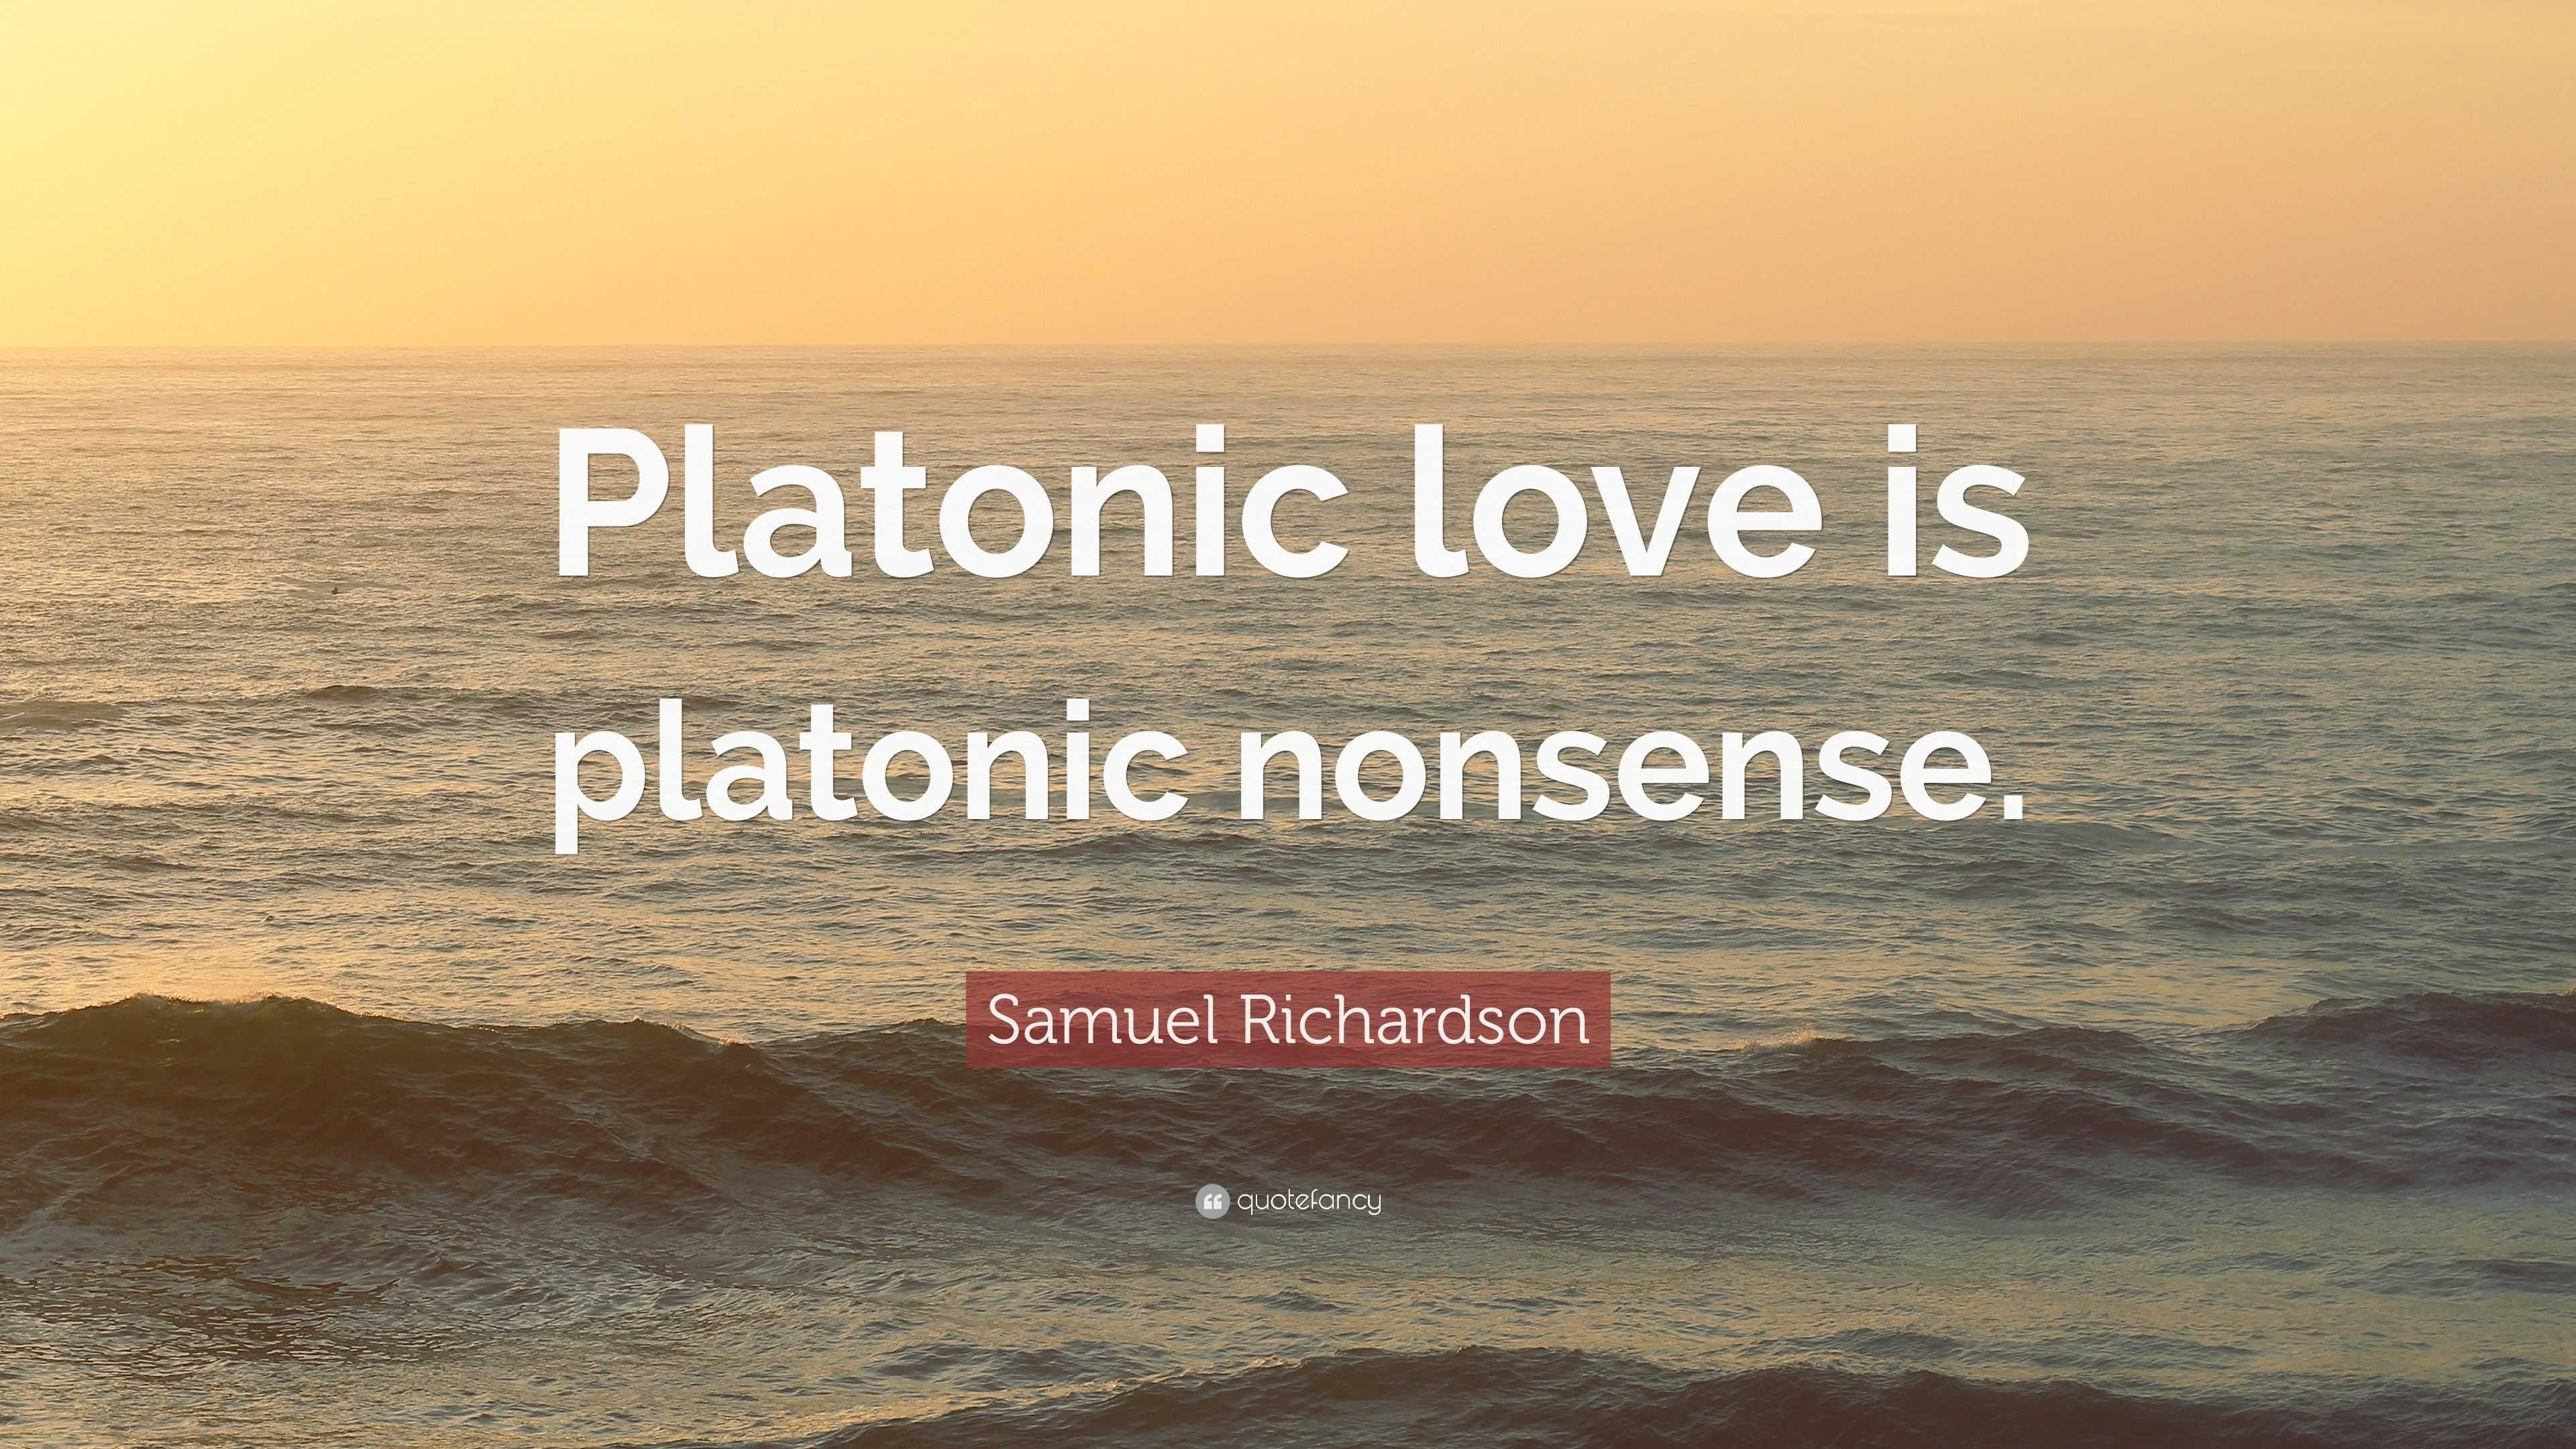 Platonic love is what